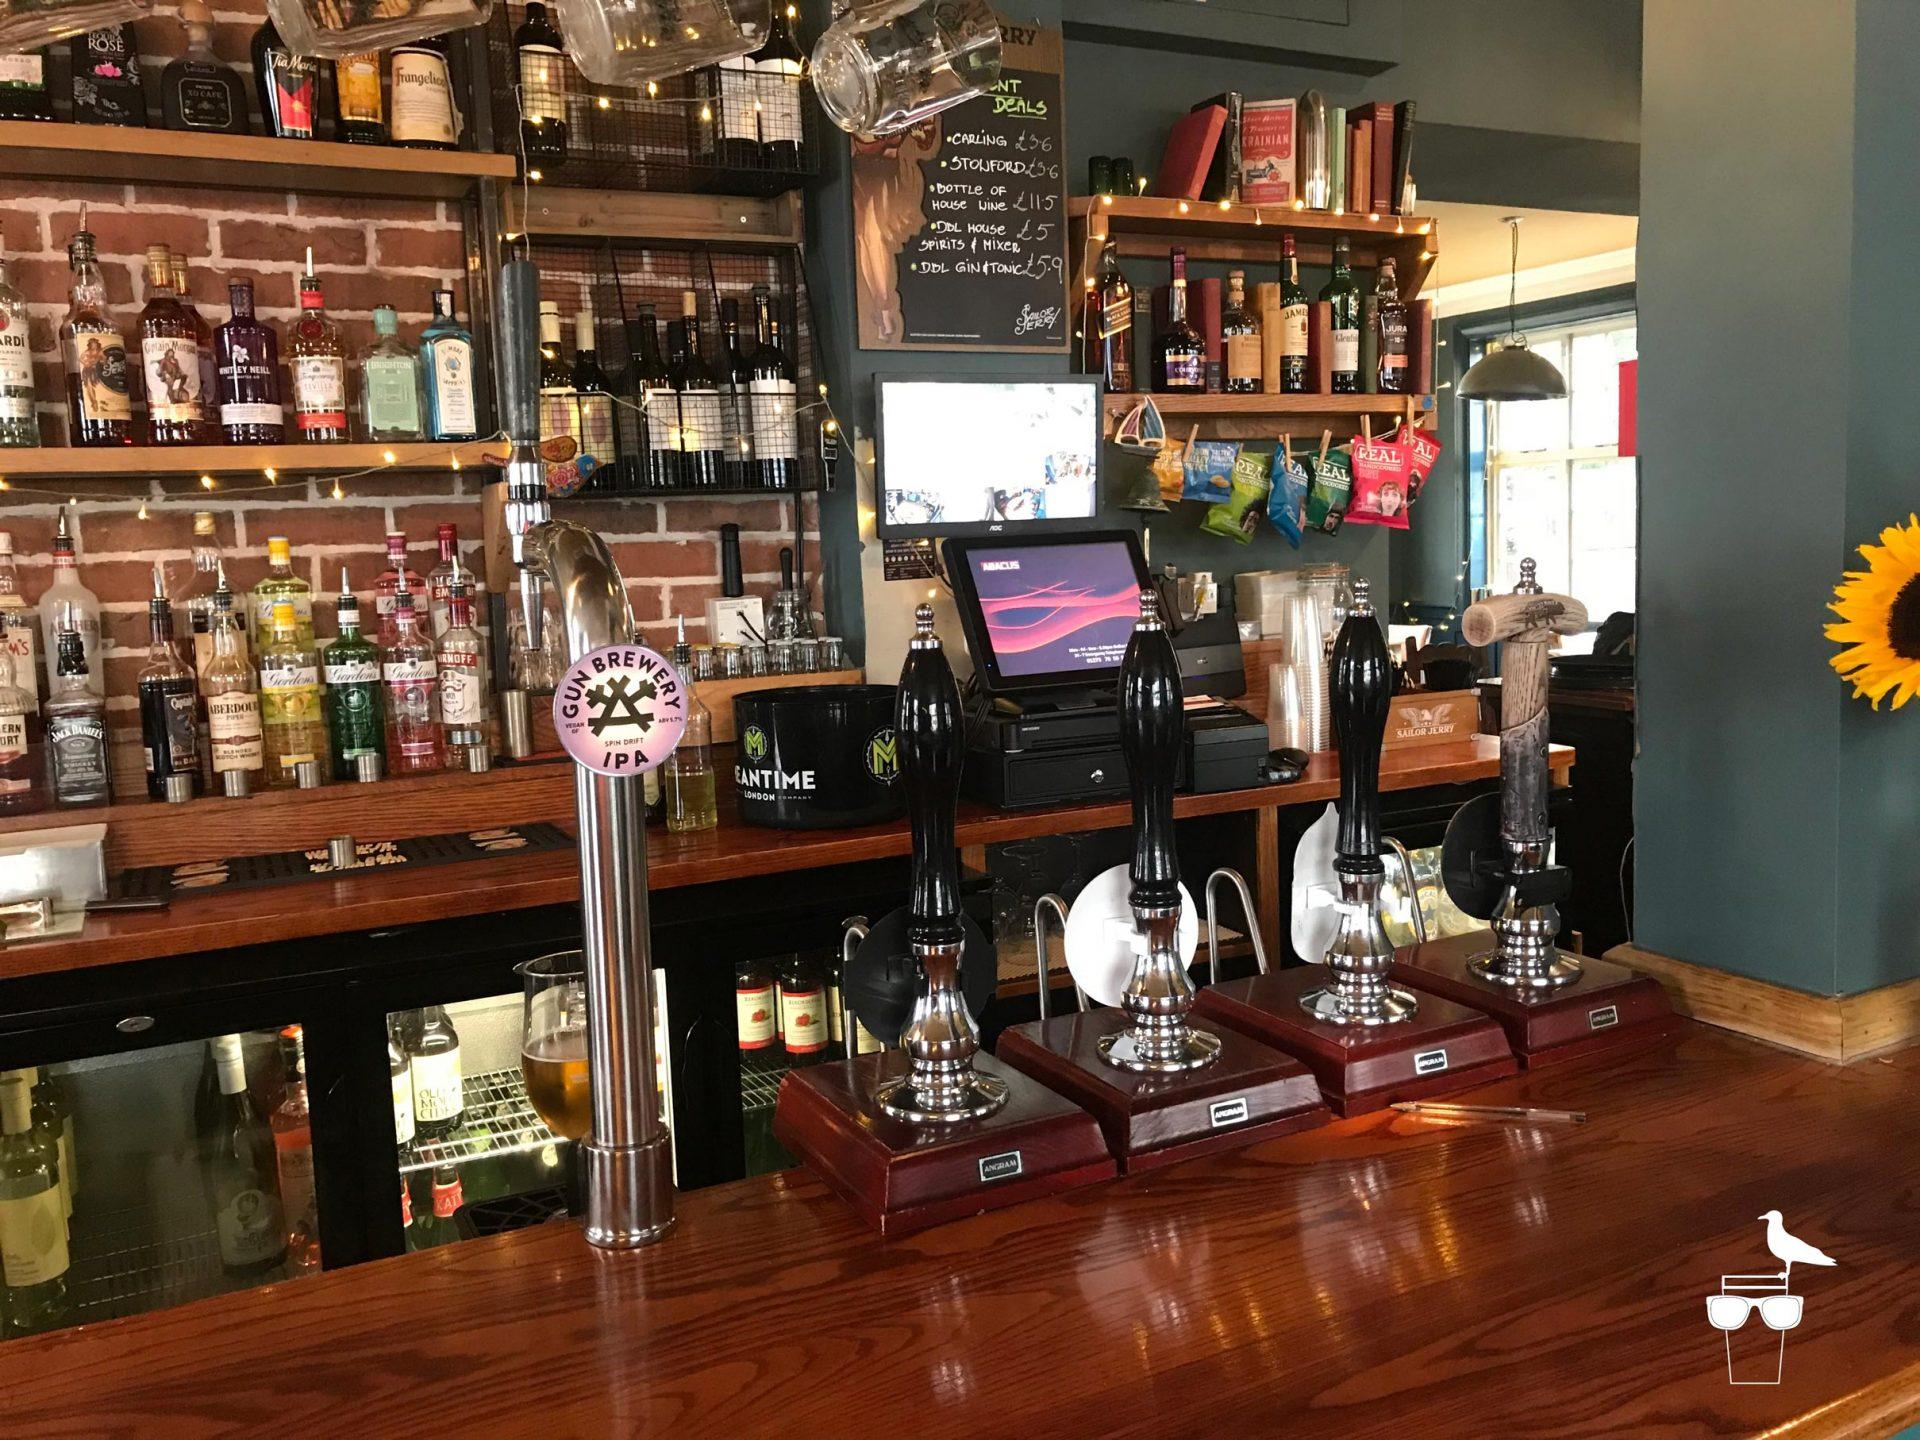 martha-gunn-pub-brighton-inside-bar